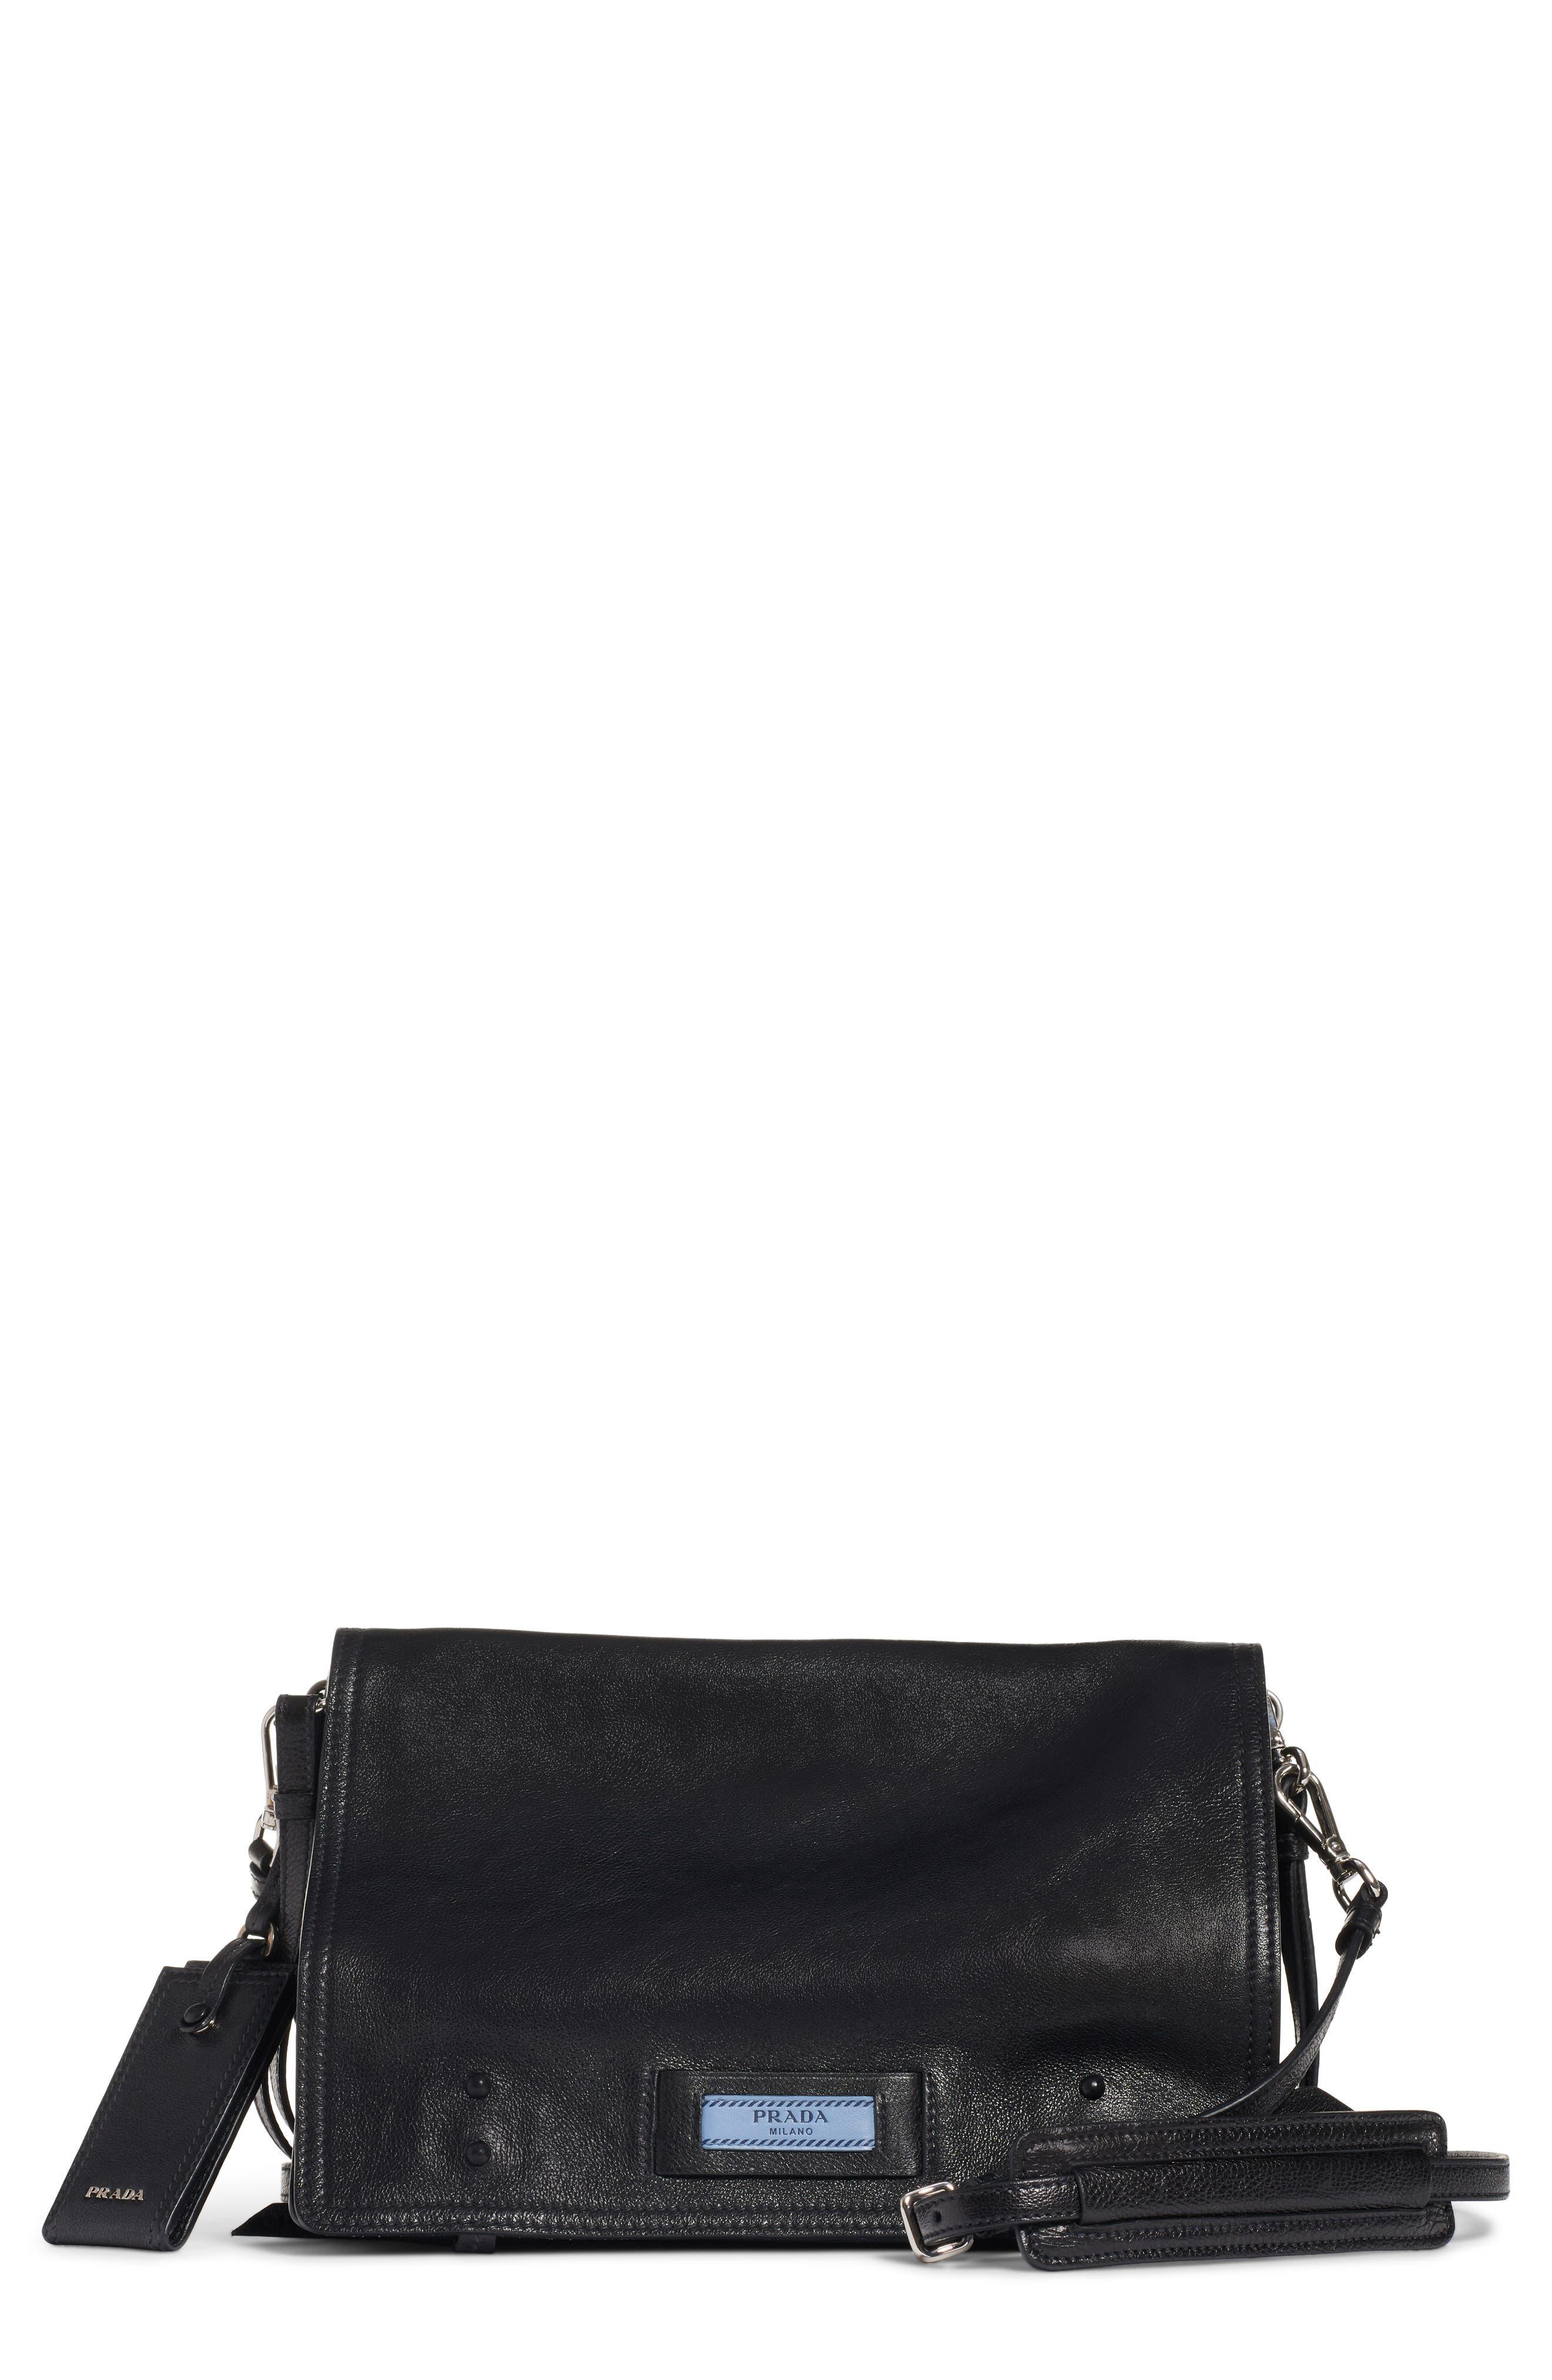 a6bae09cbf Prada Shoulder Bags